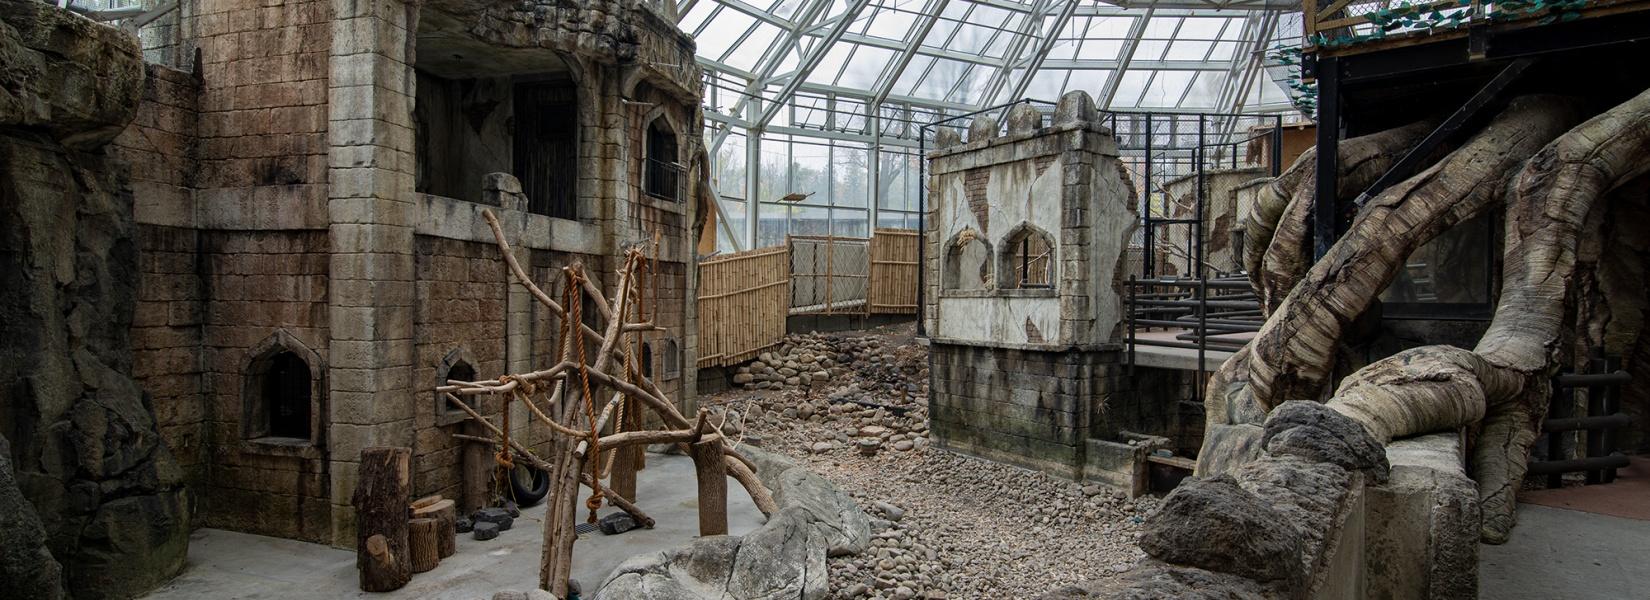 Le zoo abandonné